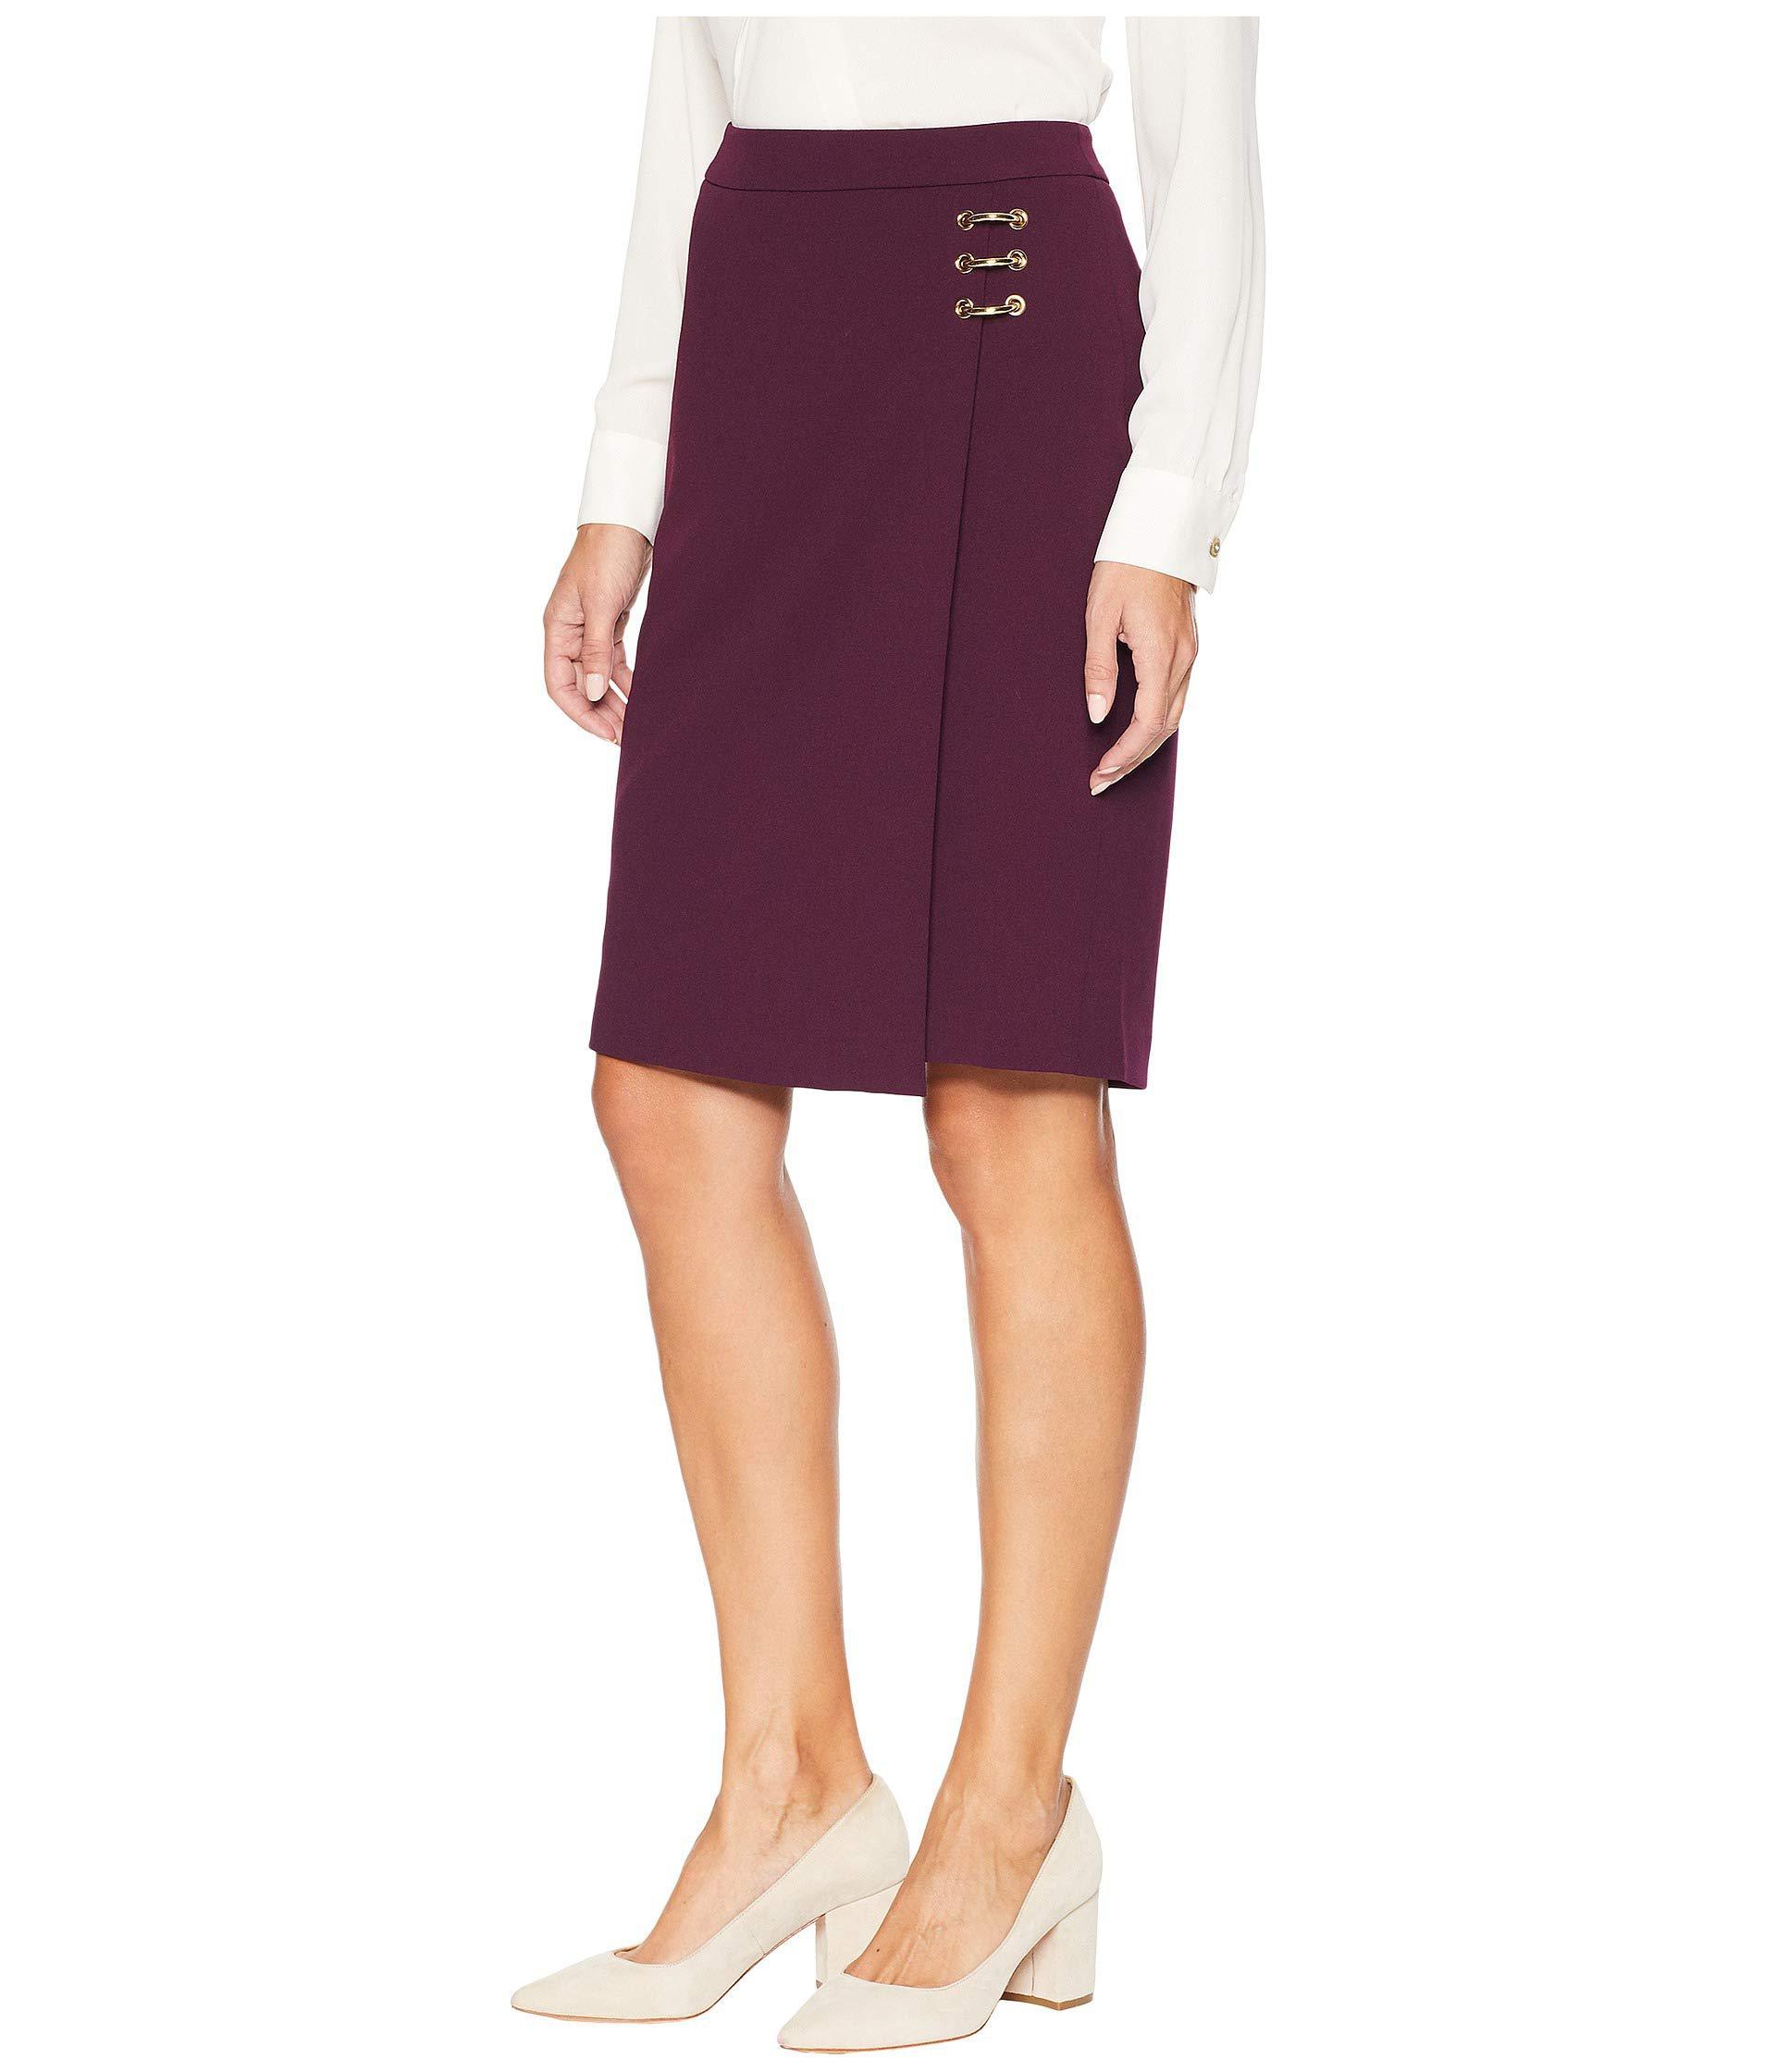 dbf6a207af81 Lyst - Calvin Klein Pencil Skirt W/ Ring Hardware in Purple - Save 29%